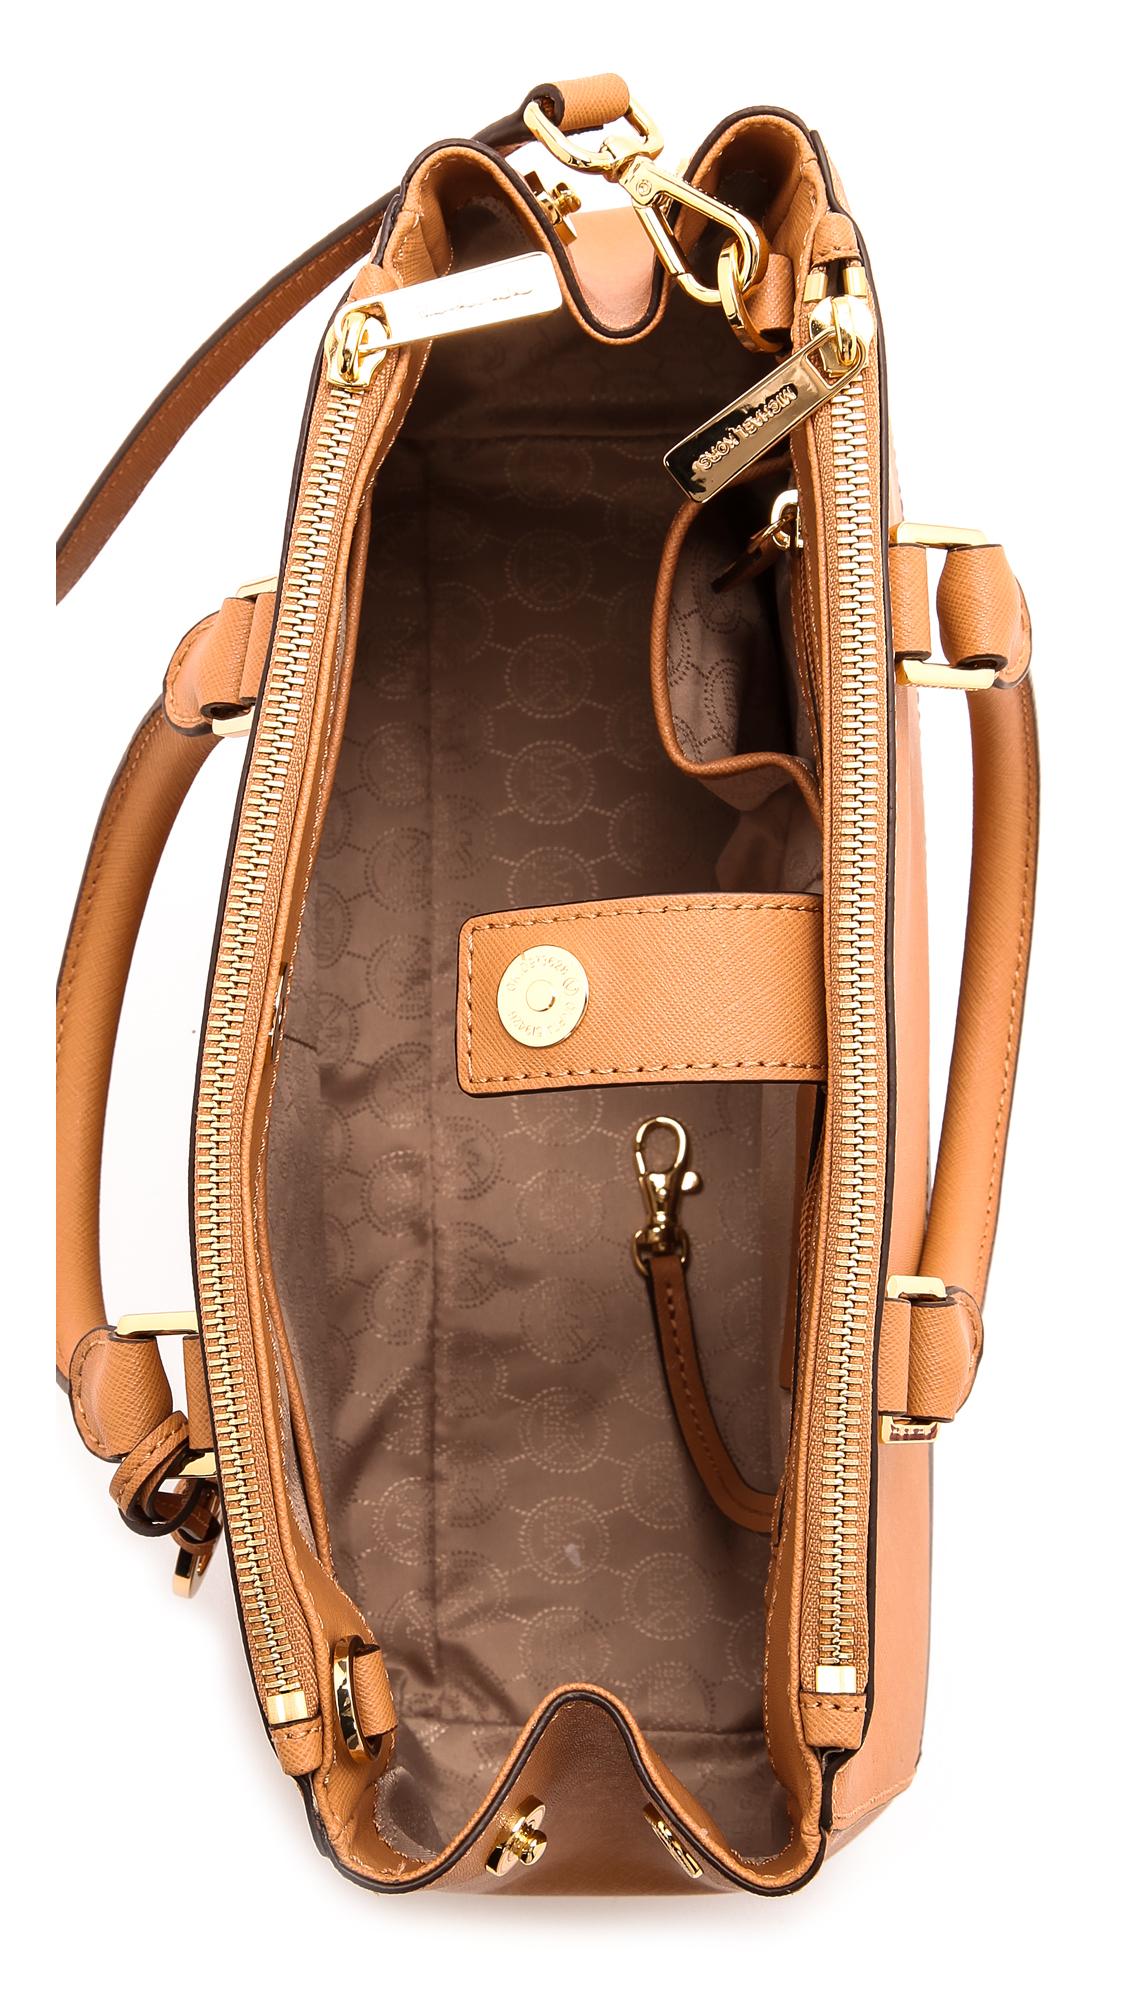 477fcf45f74e purchase michael kors handbags ad2a9 a6323; switzerland lyst michael  michael kors sutton bicolor medium satchel optic 0b4ed 2239f